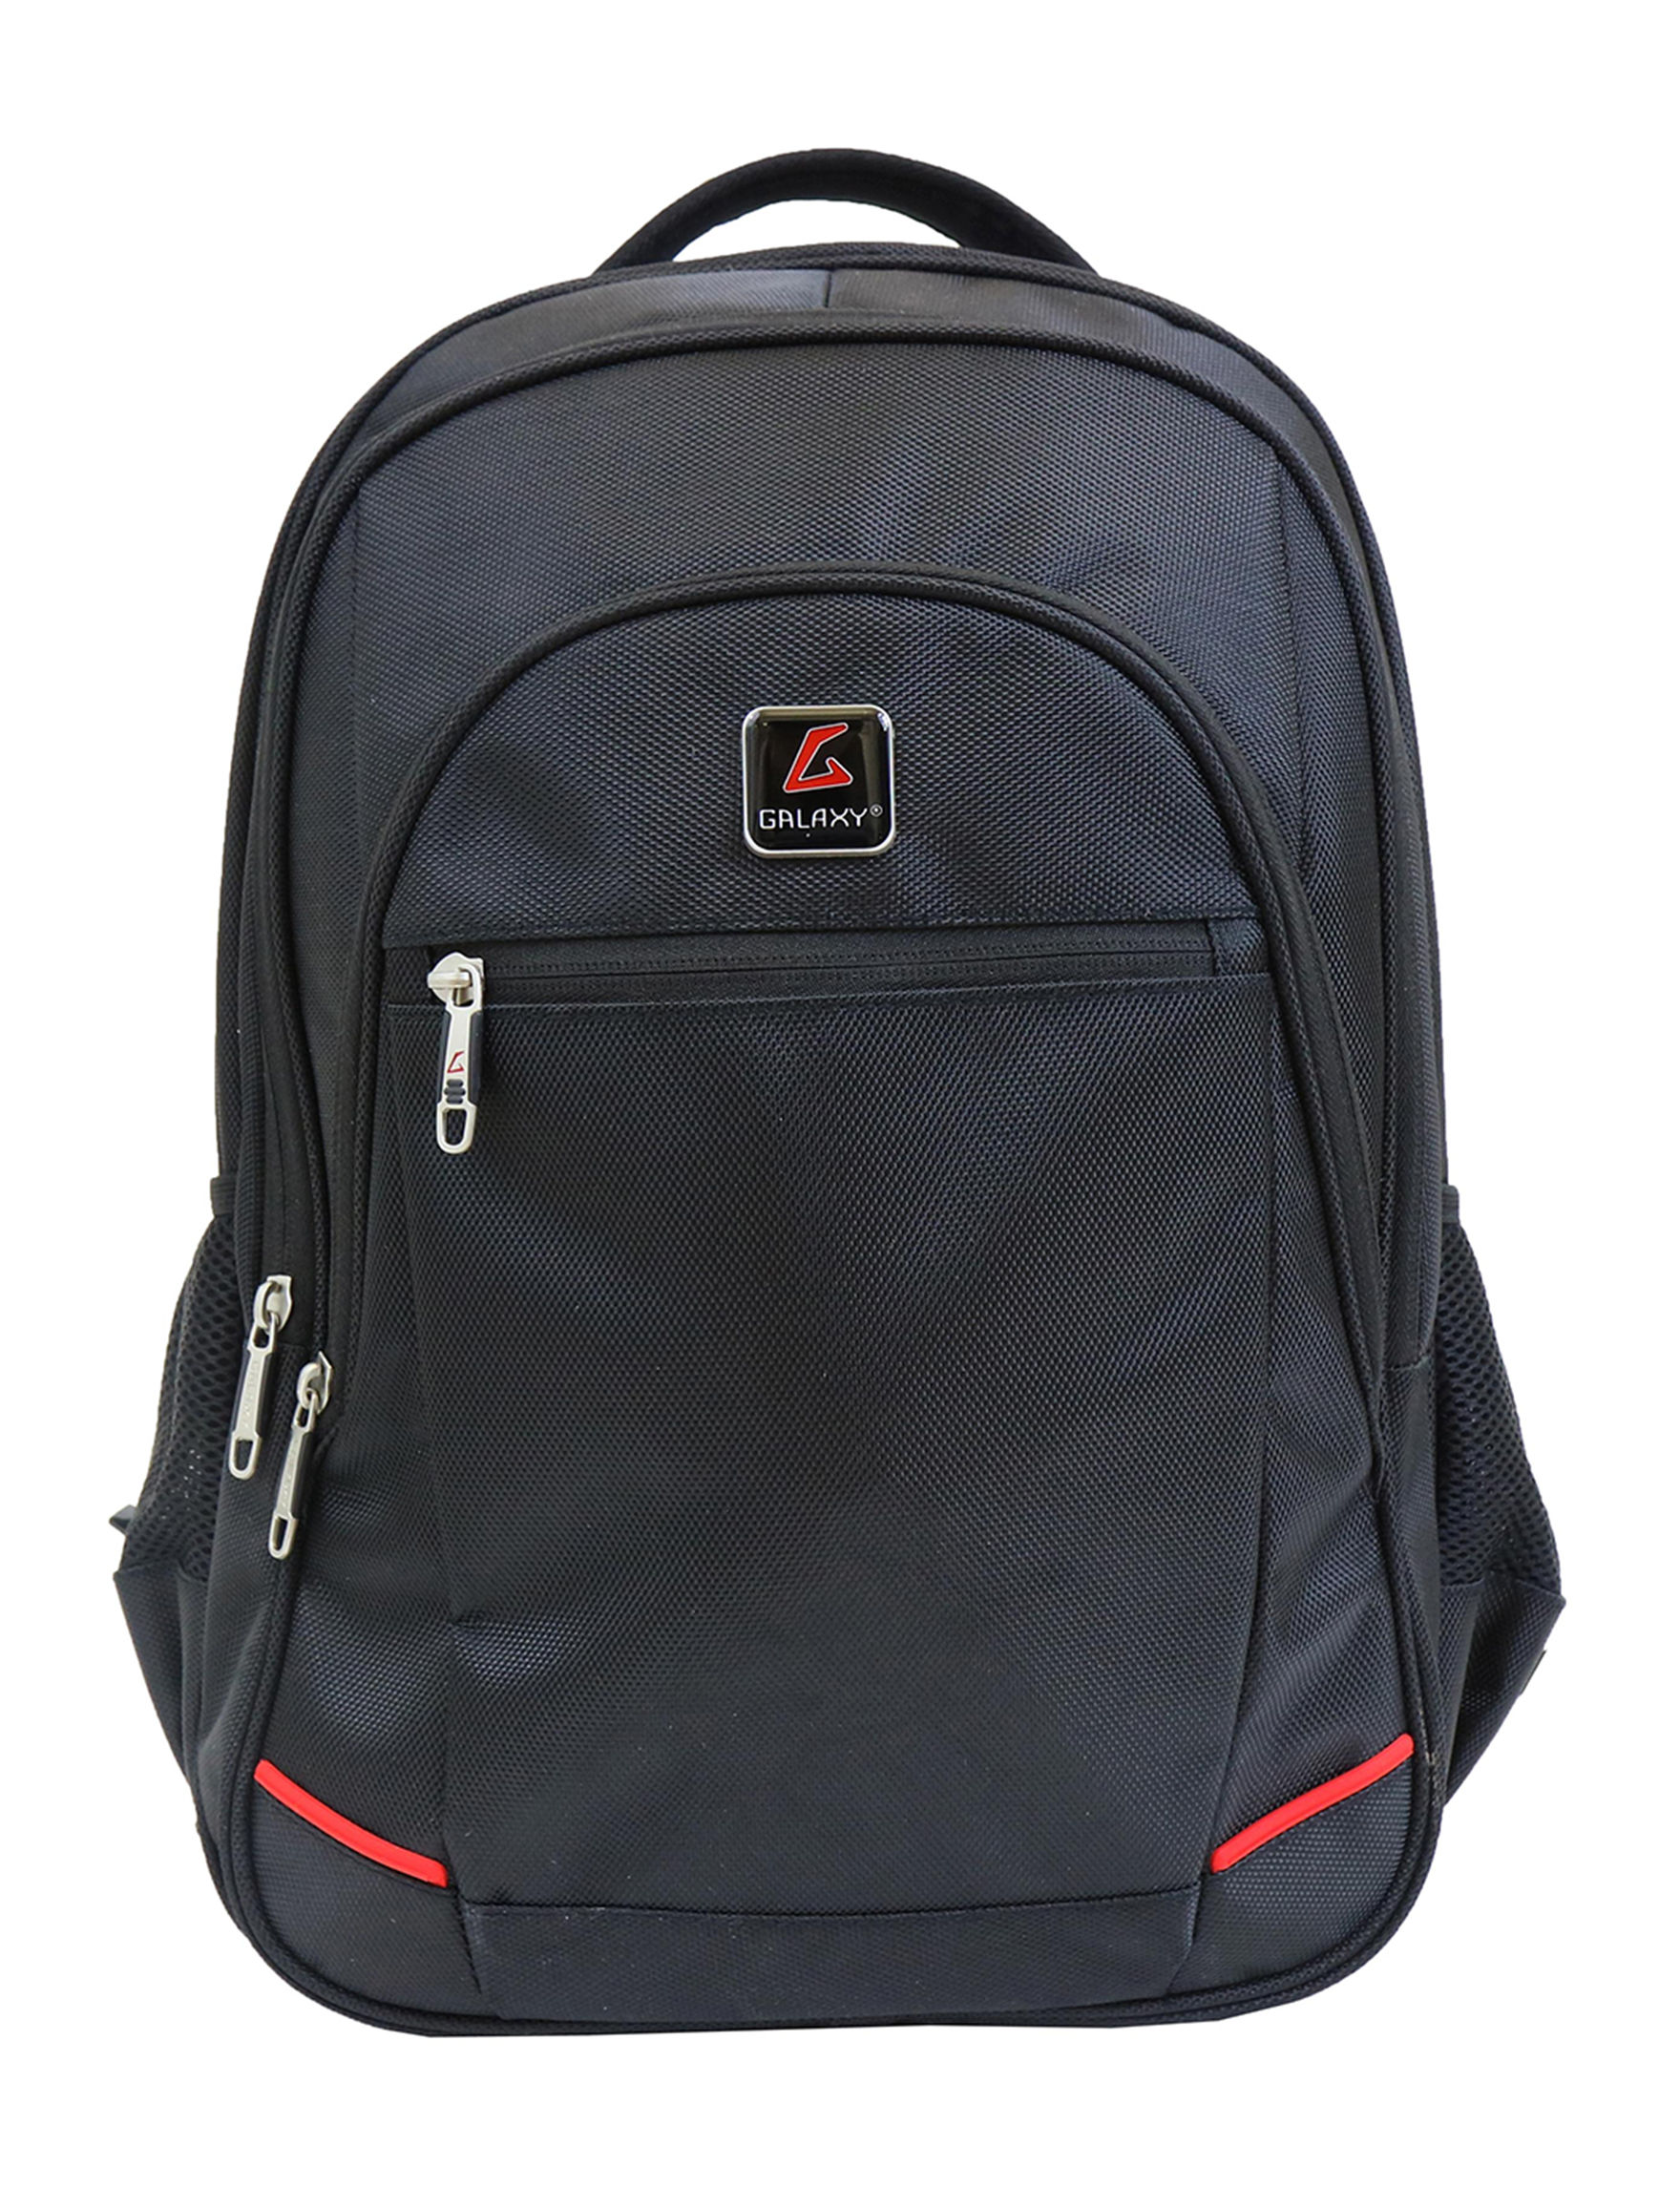 Galaxy by Harvic Black Bookbags & Backpacks